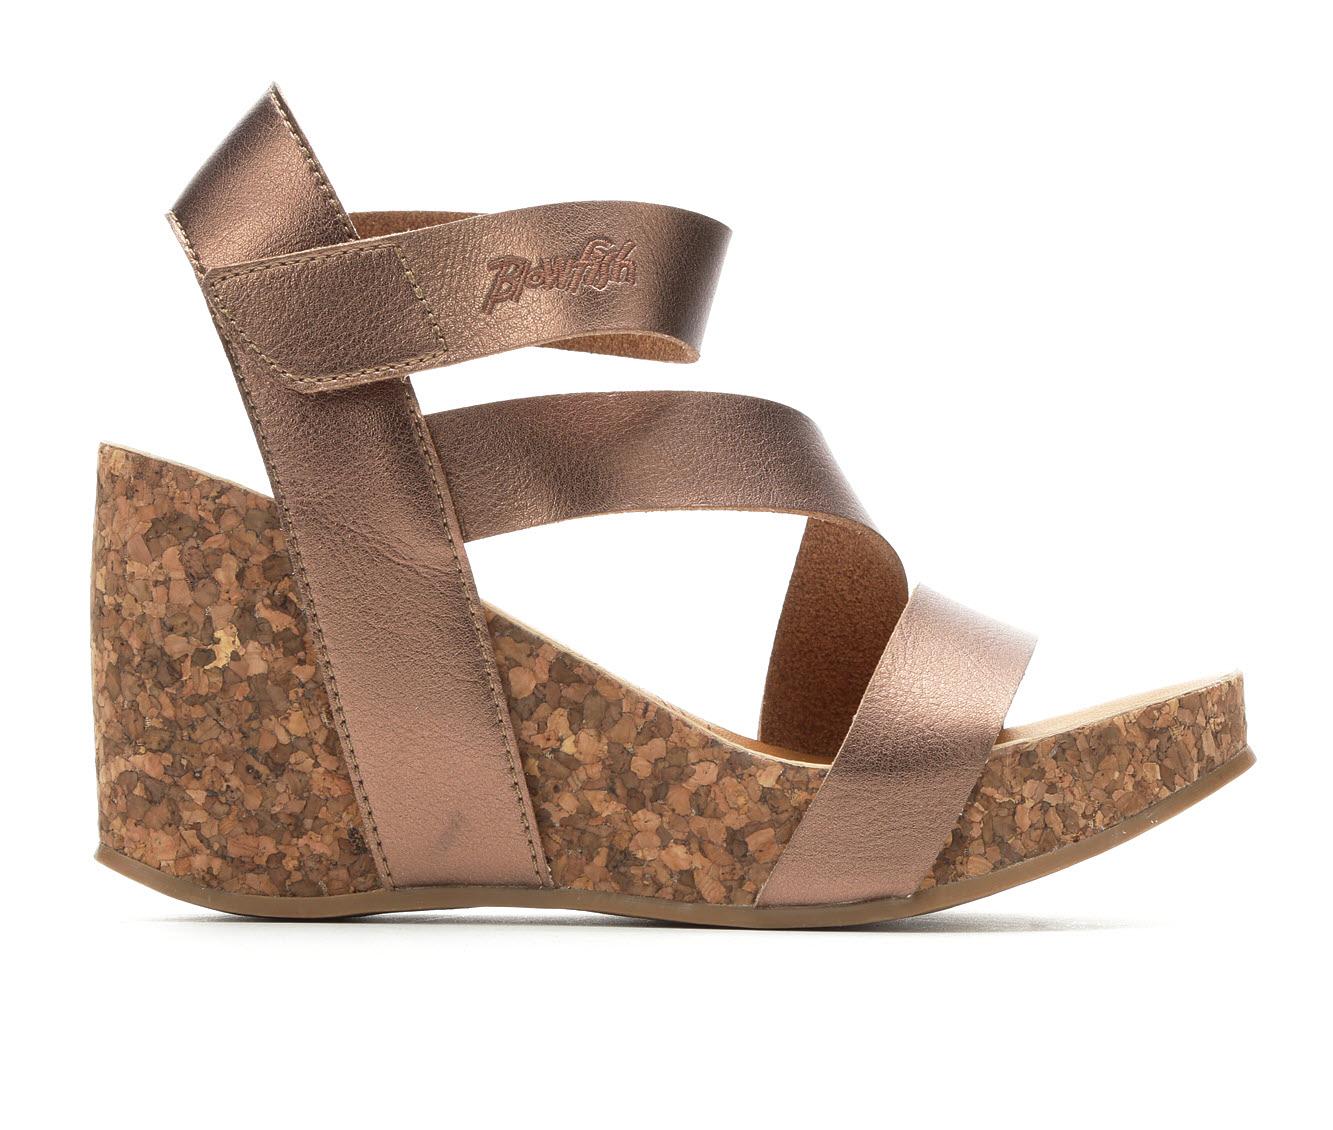 Blowfish Malibu Hapuku Women's Dress Shoe (Gold Faux Leather)